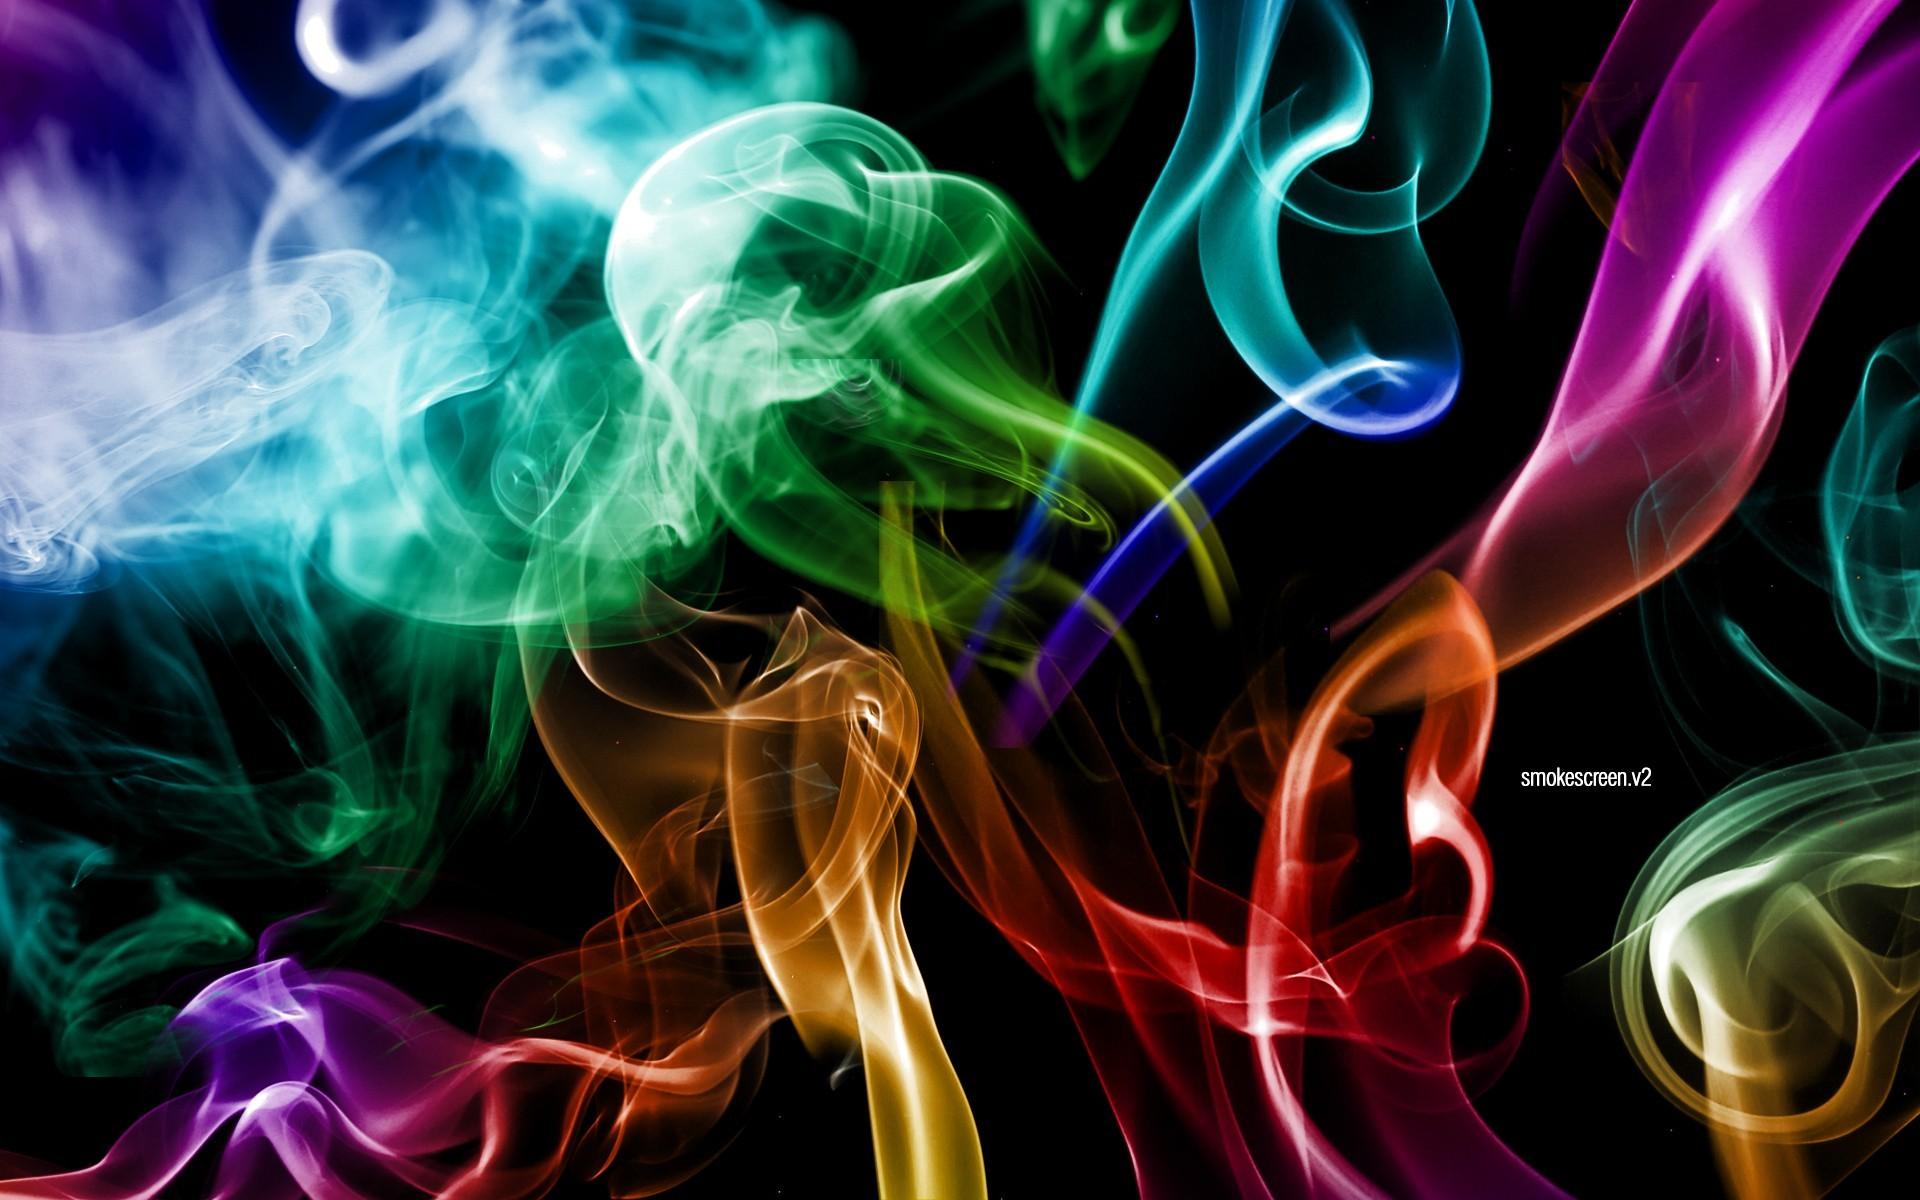 Wallpapers Colors HD [Megapost] – Taringa!